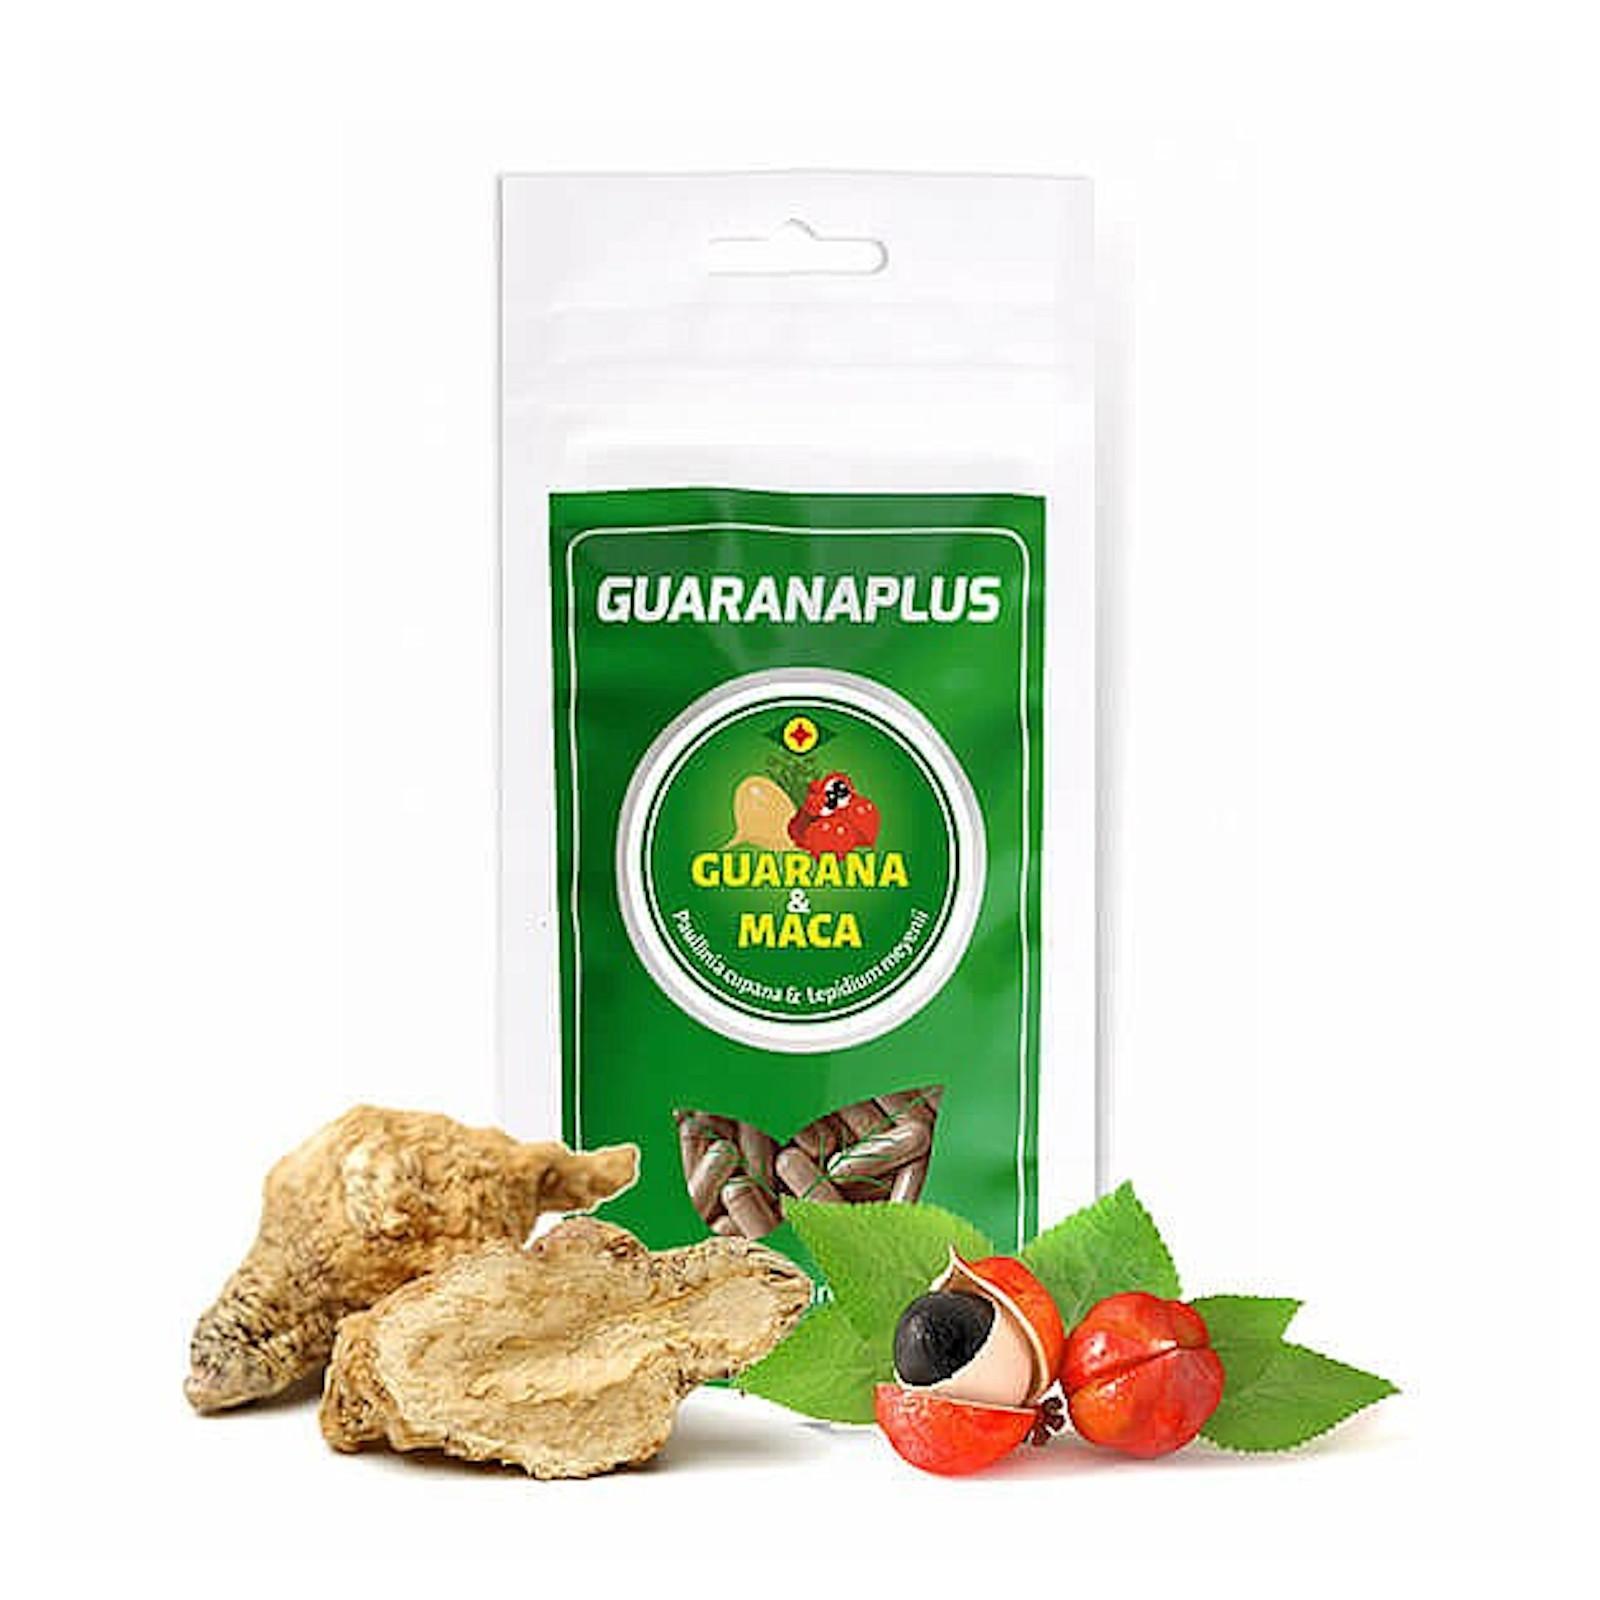 Guaranaplus Guarana + Maca 100 kapslí